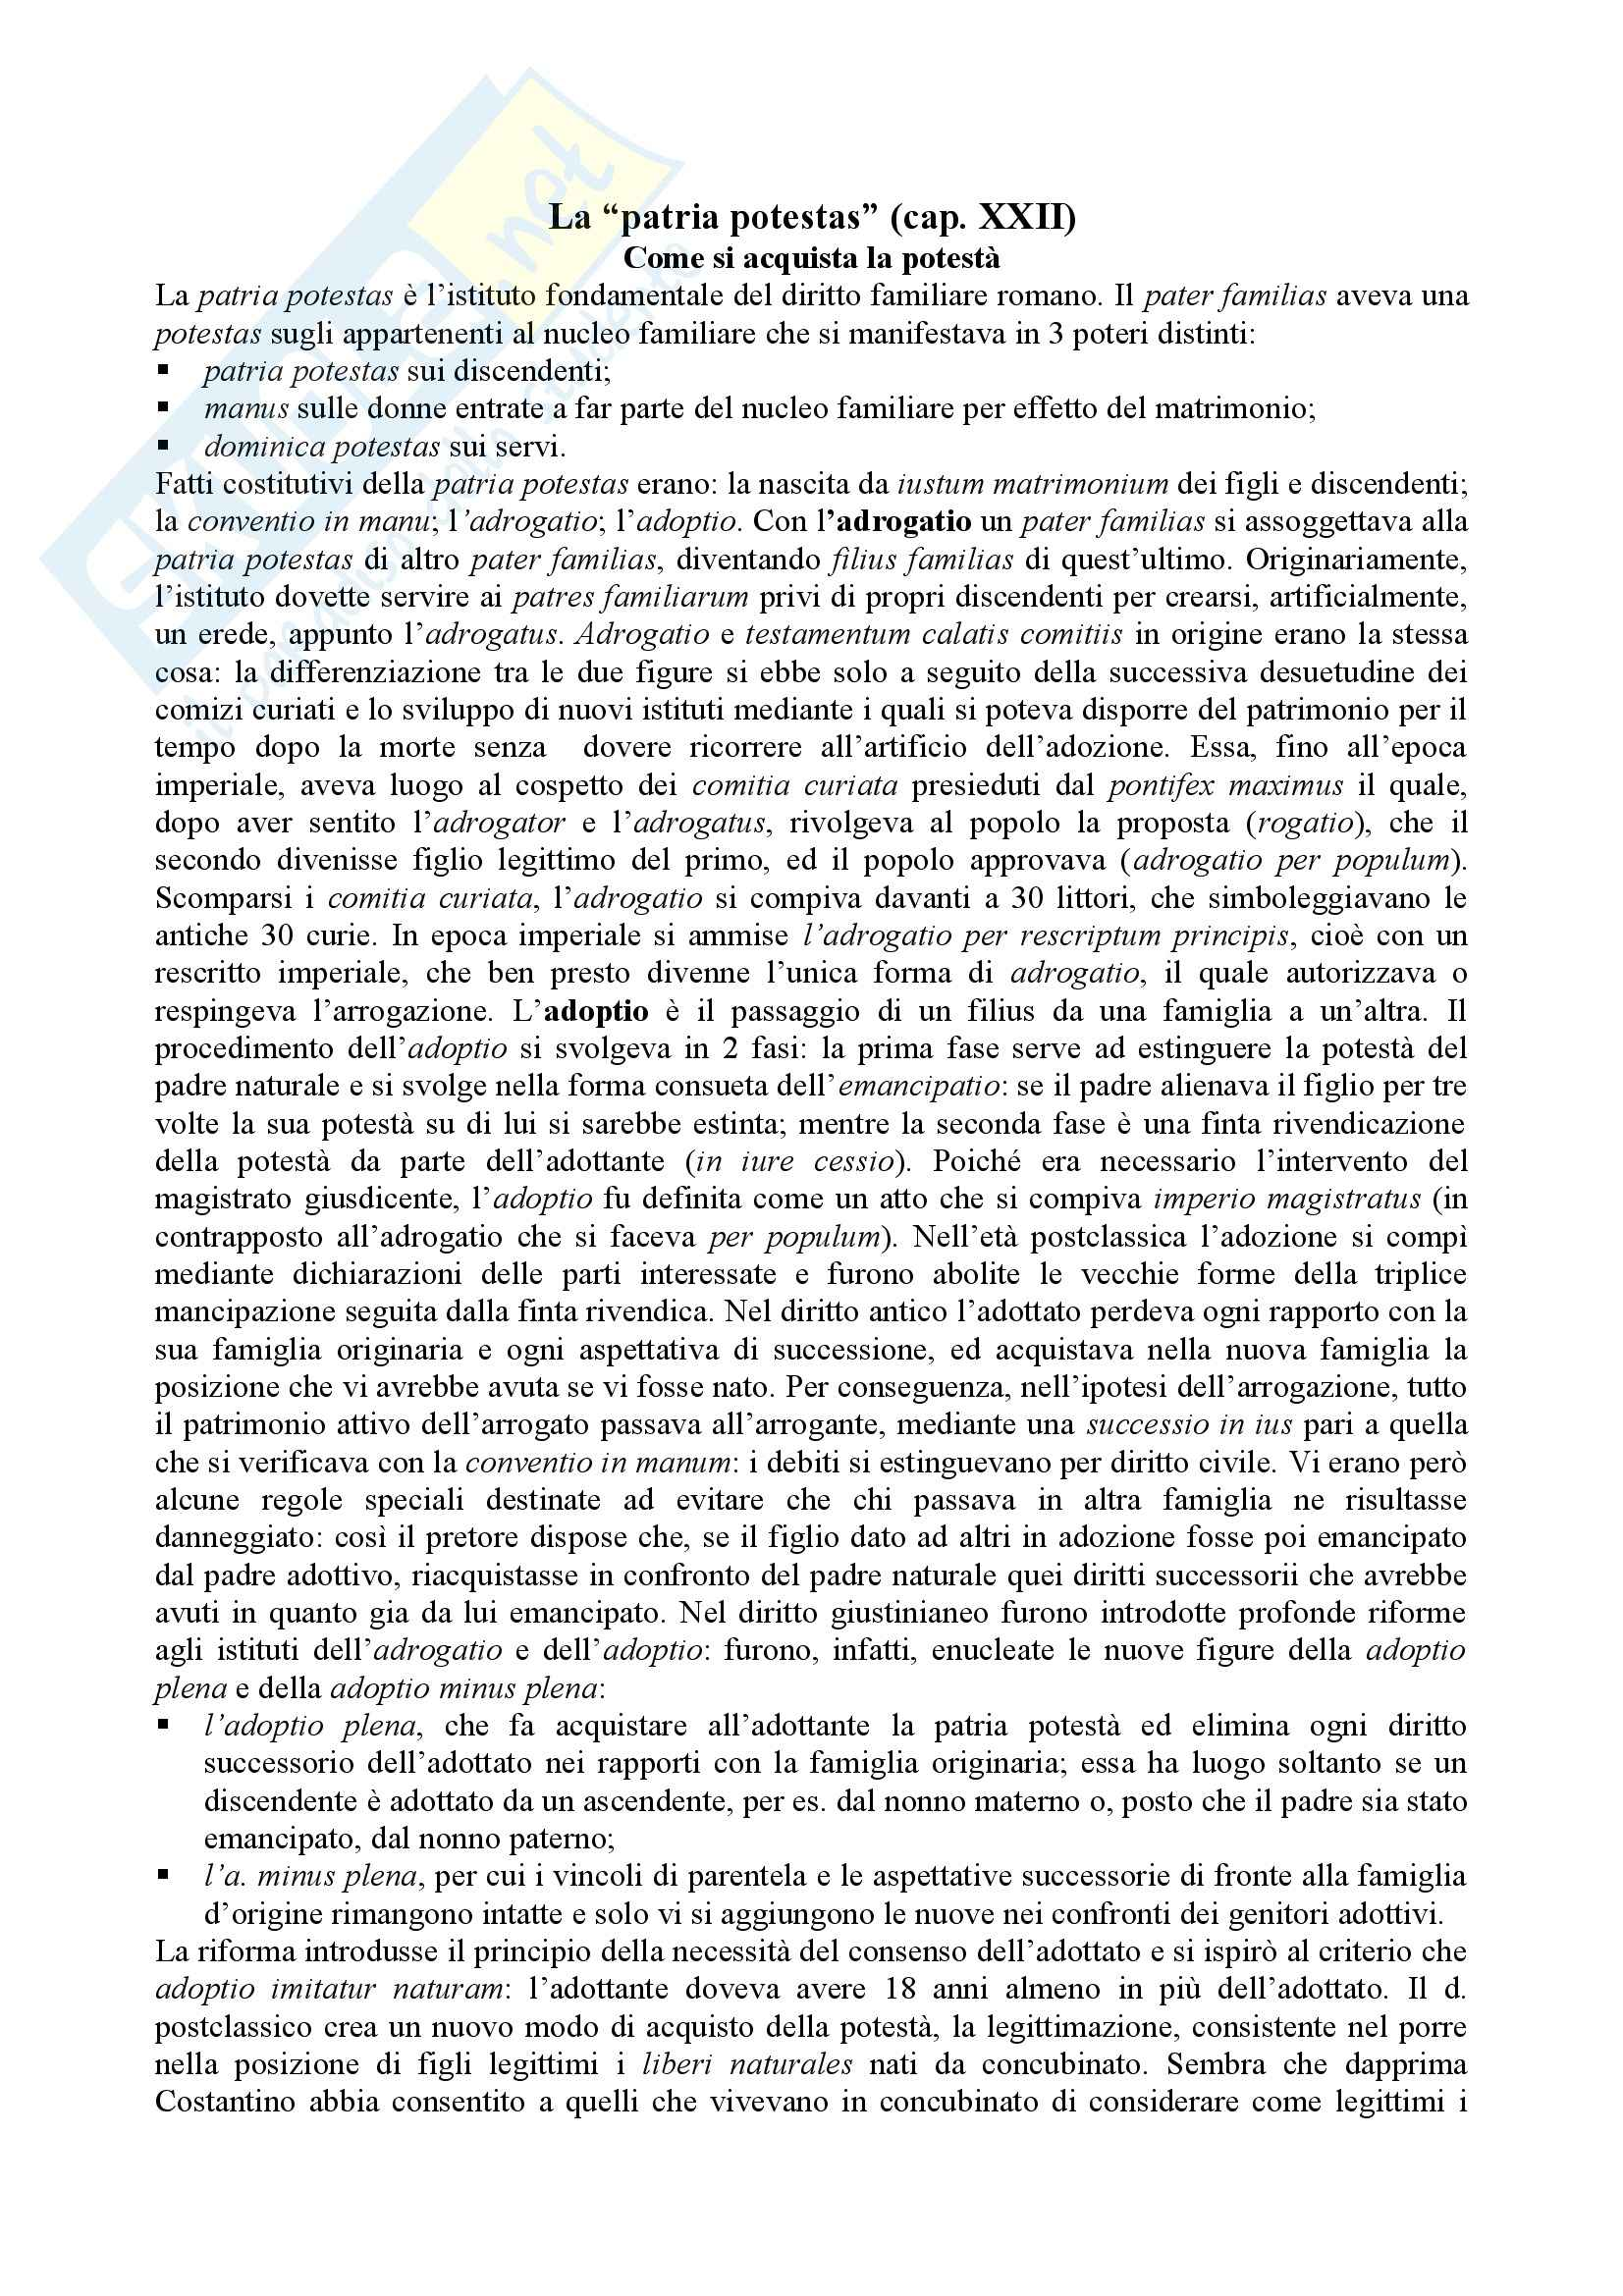 Diritto romano - la patria potestas